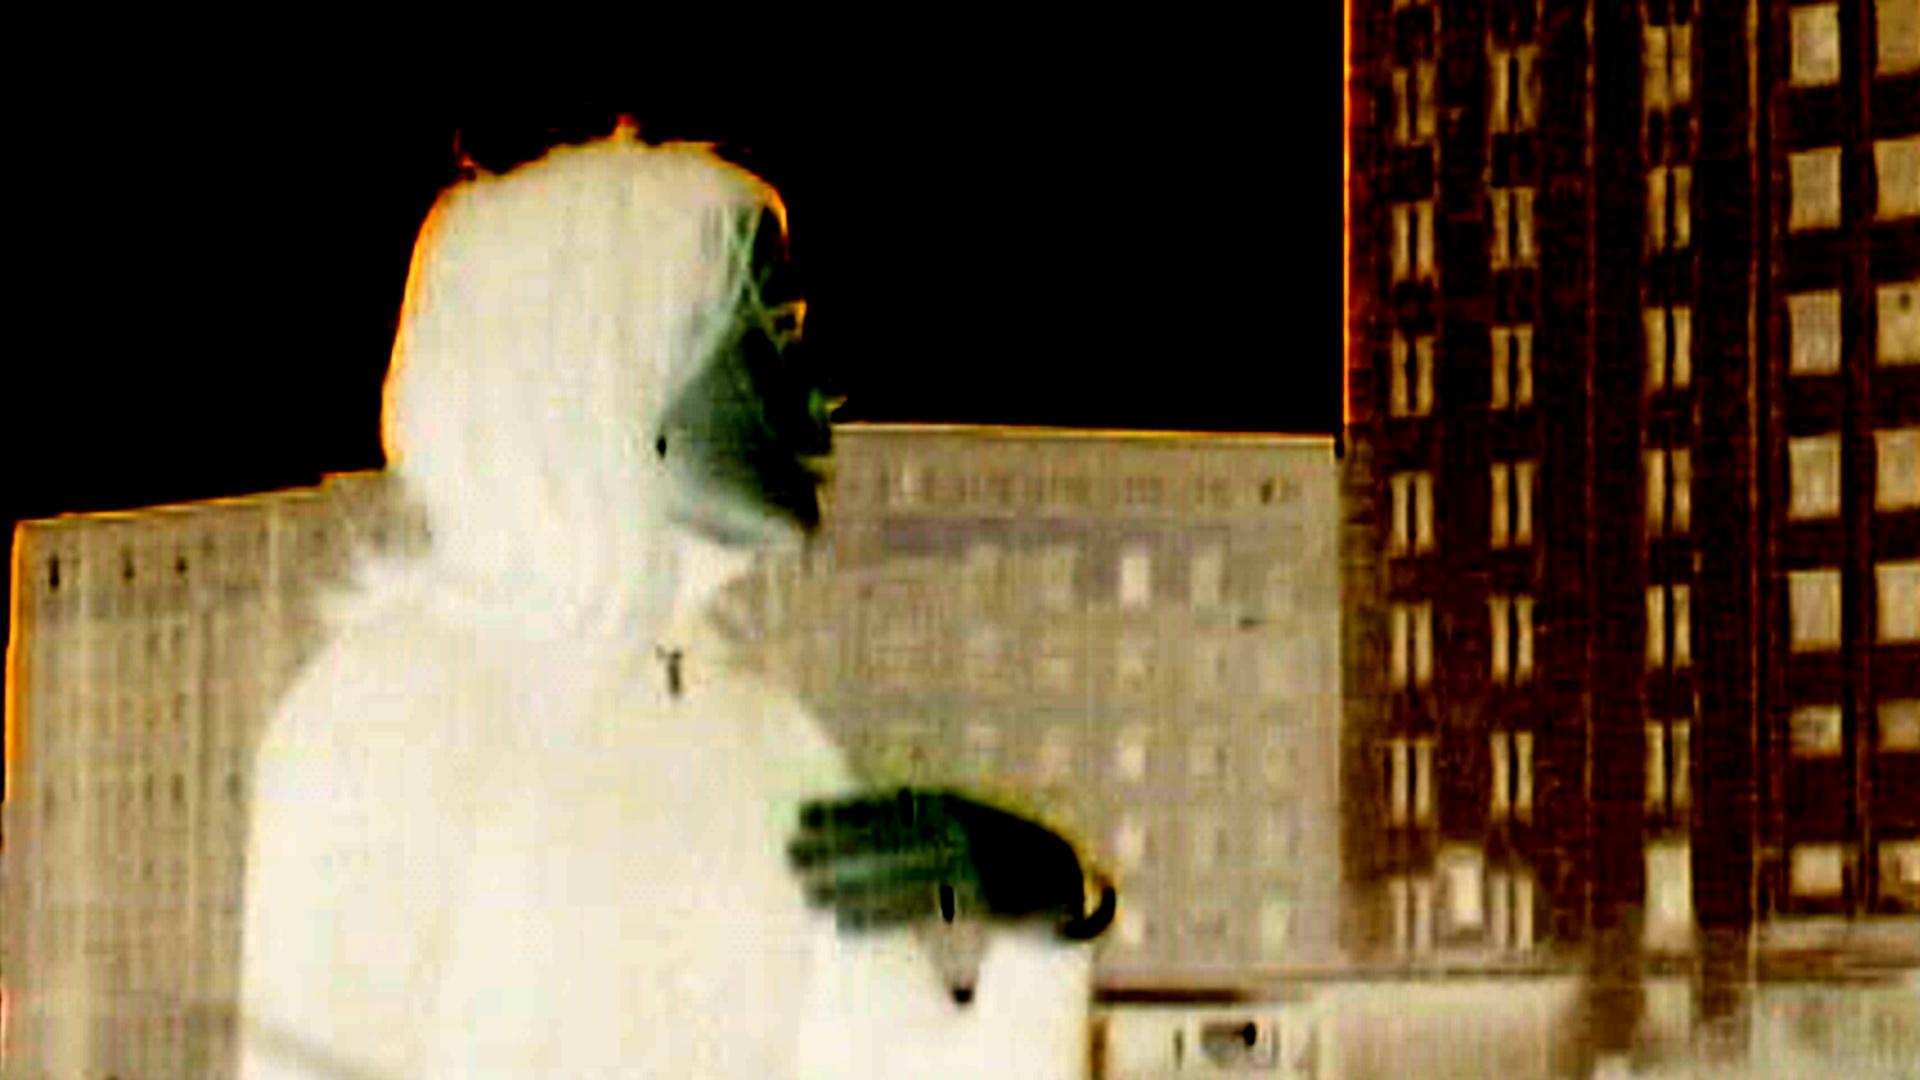 Rohan Quine, 'The Imagination Thief' - film 'MARC 5', still 17